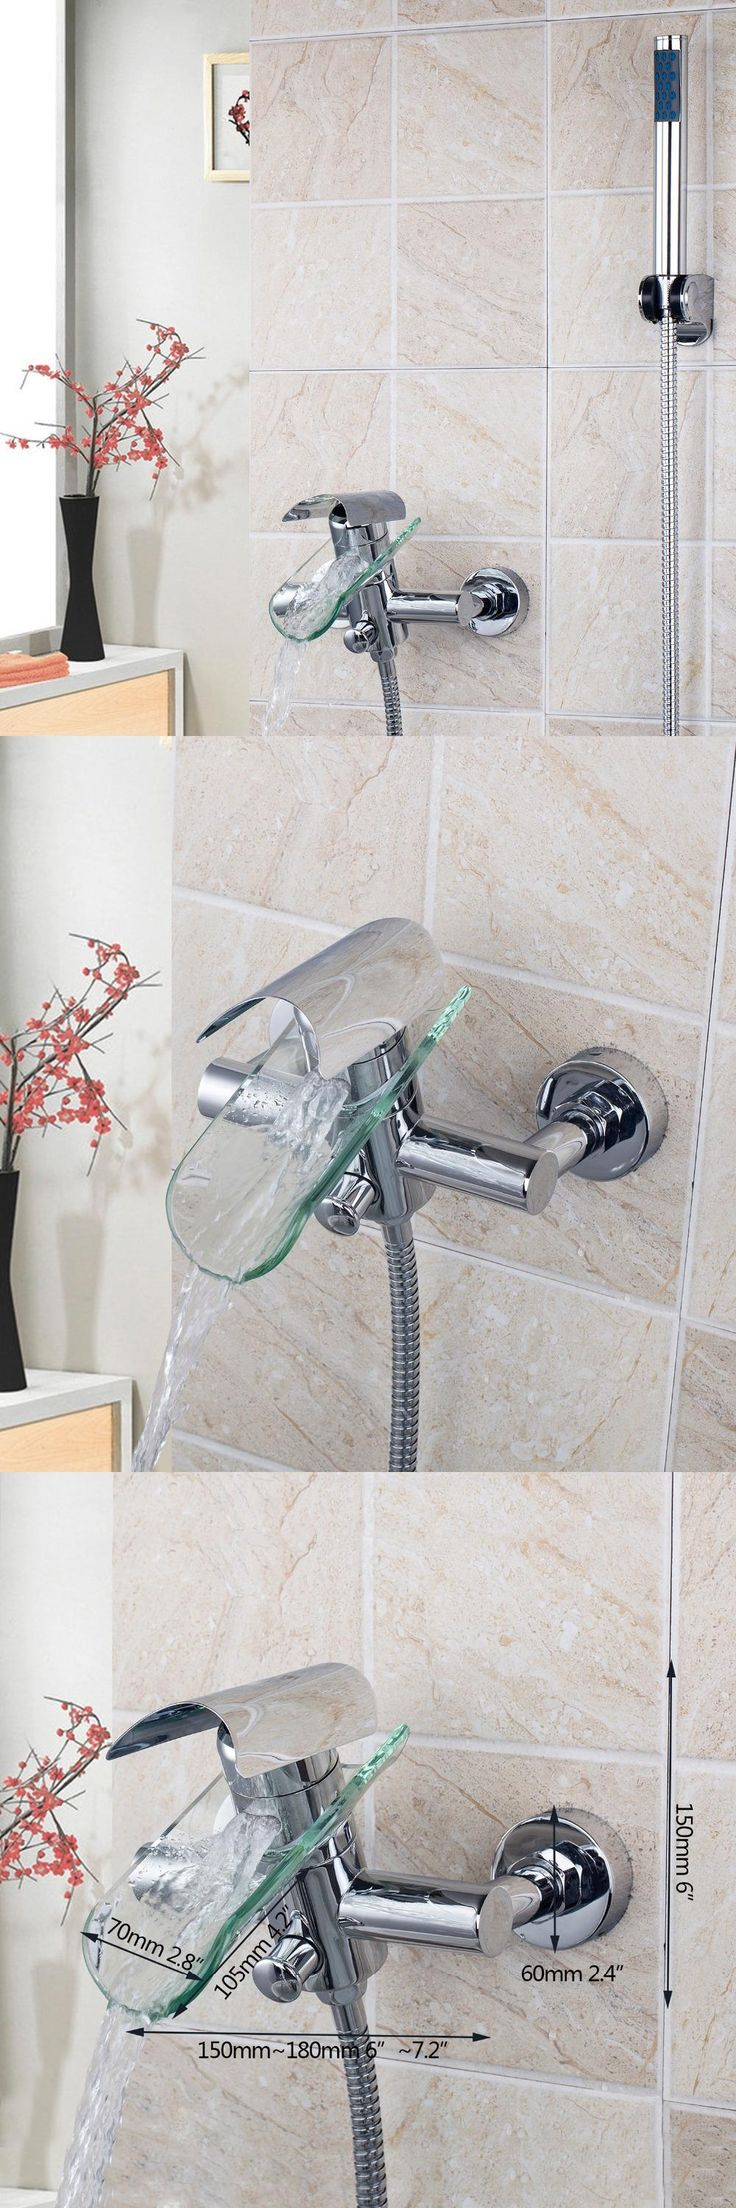 [Visit to Buy] Bathroom Shower Faucet Bath Faucet Mixer Tap With Hand Shower Head Shower Faucets Set  #Advertisement